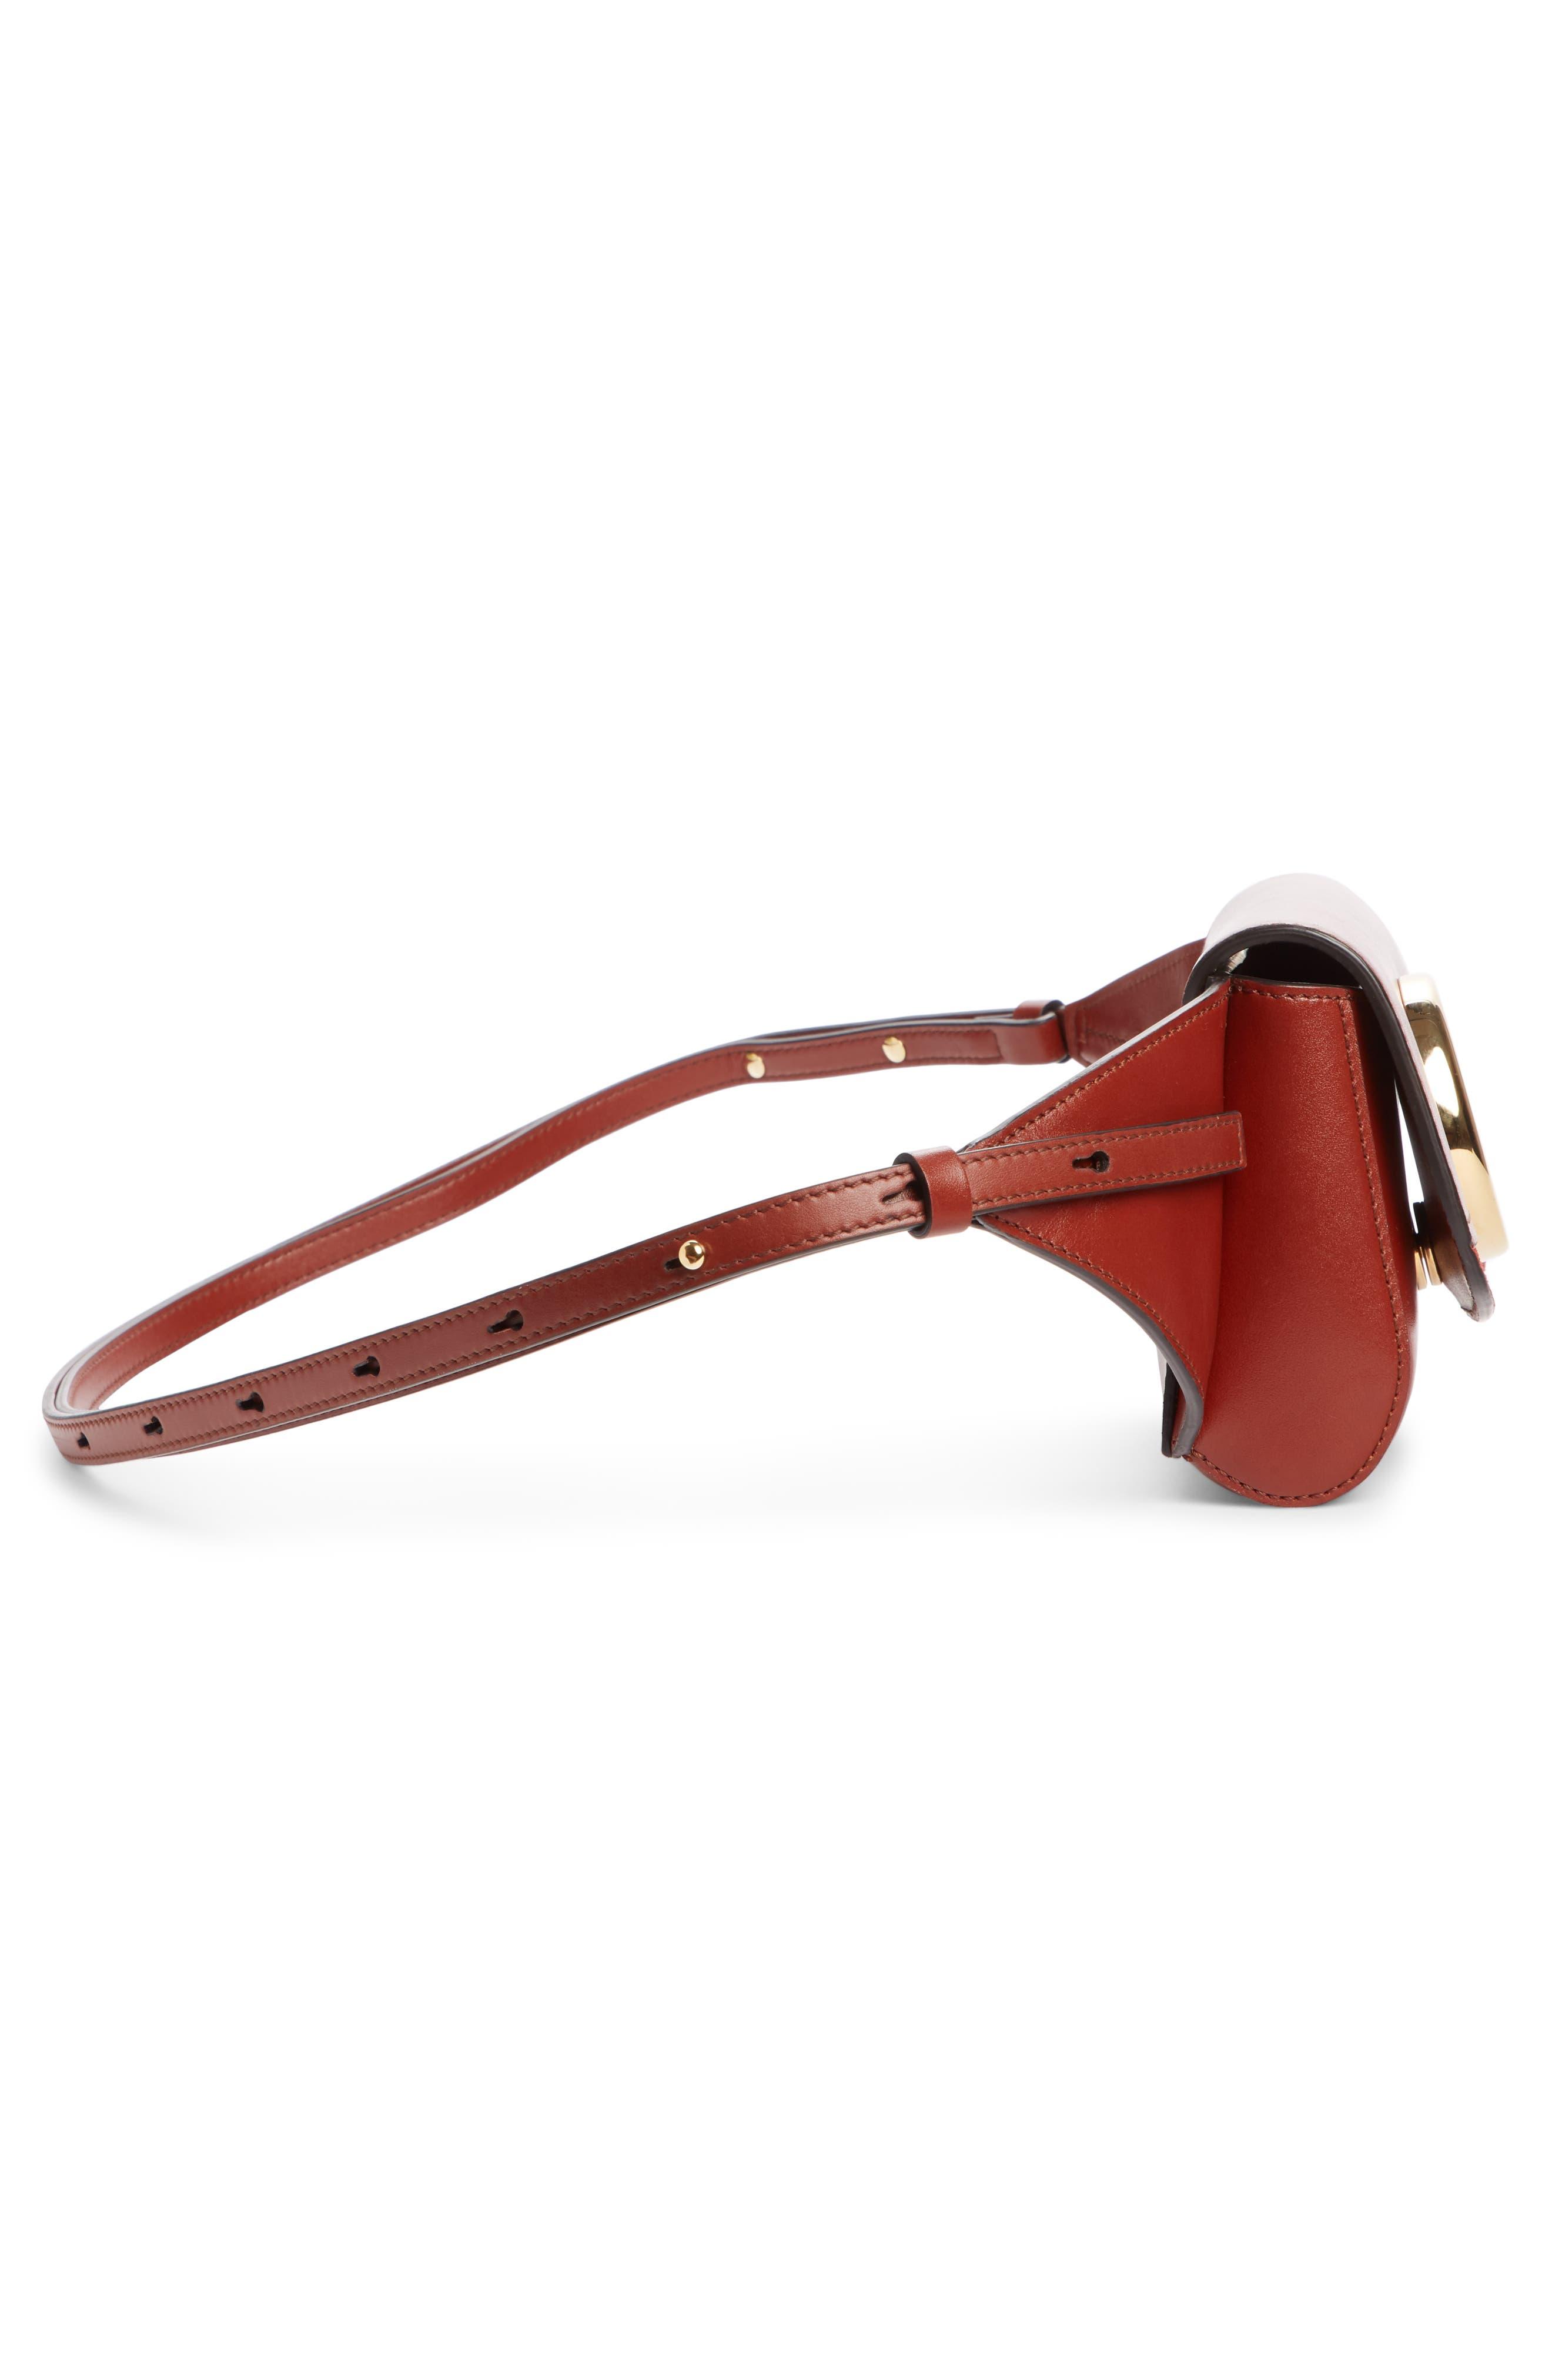 CHLOÉ,                             C Leather Convertible Belt Bag,                             Alternate thumbnail 4, color,                             SEPIA BROWN